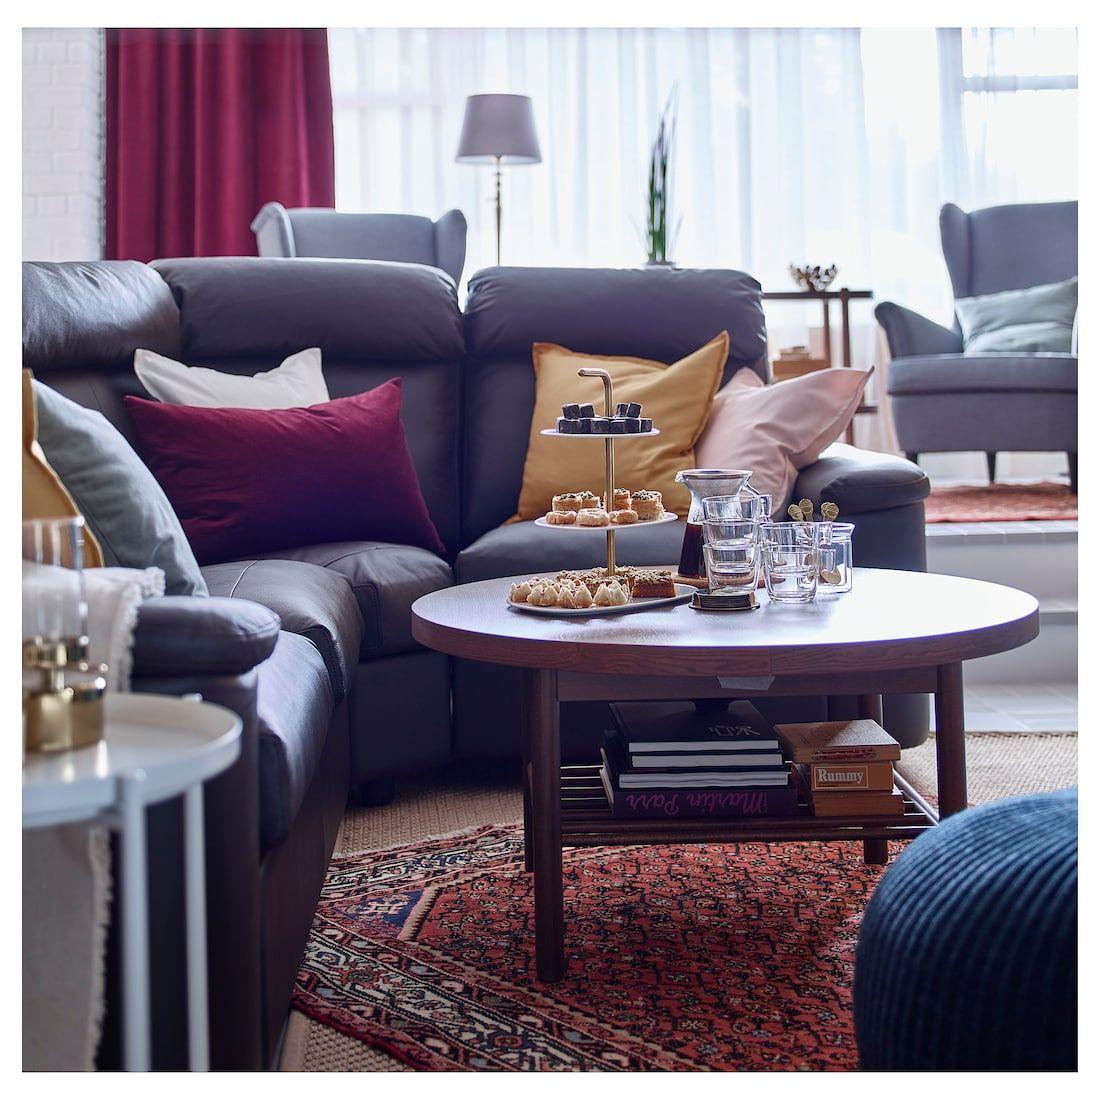 Listerby Coffee Table Brown 35 3 8 Ikea Coffee Table Living Room Corner Farm House Living Room [ 1100 x 1100 Pixel ]